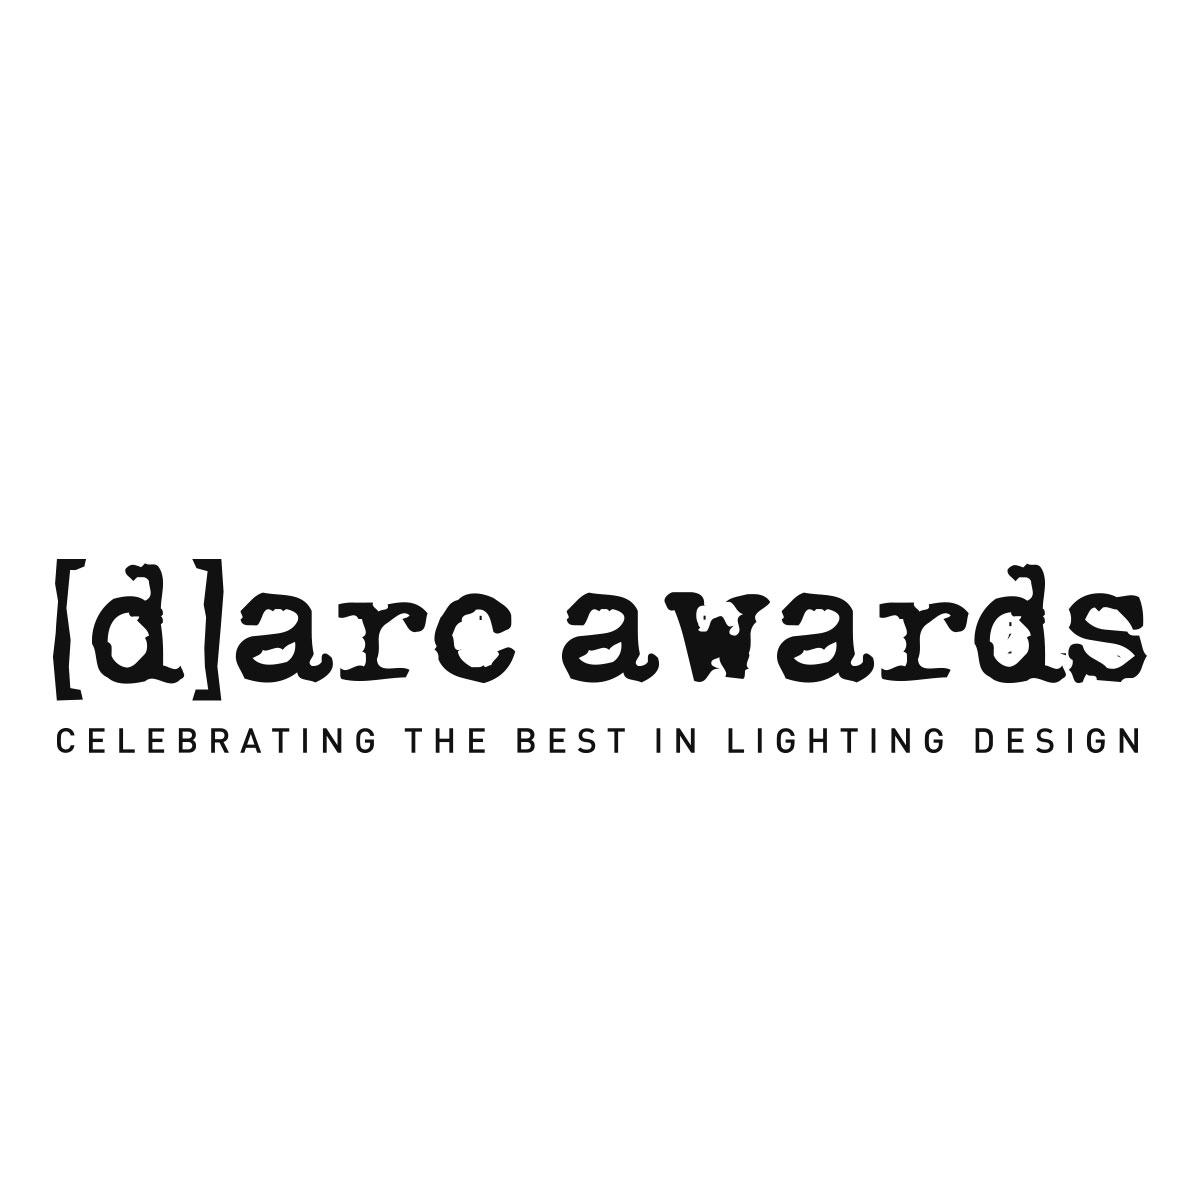 darc awards